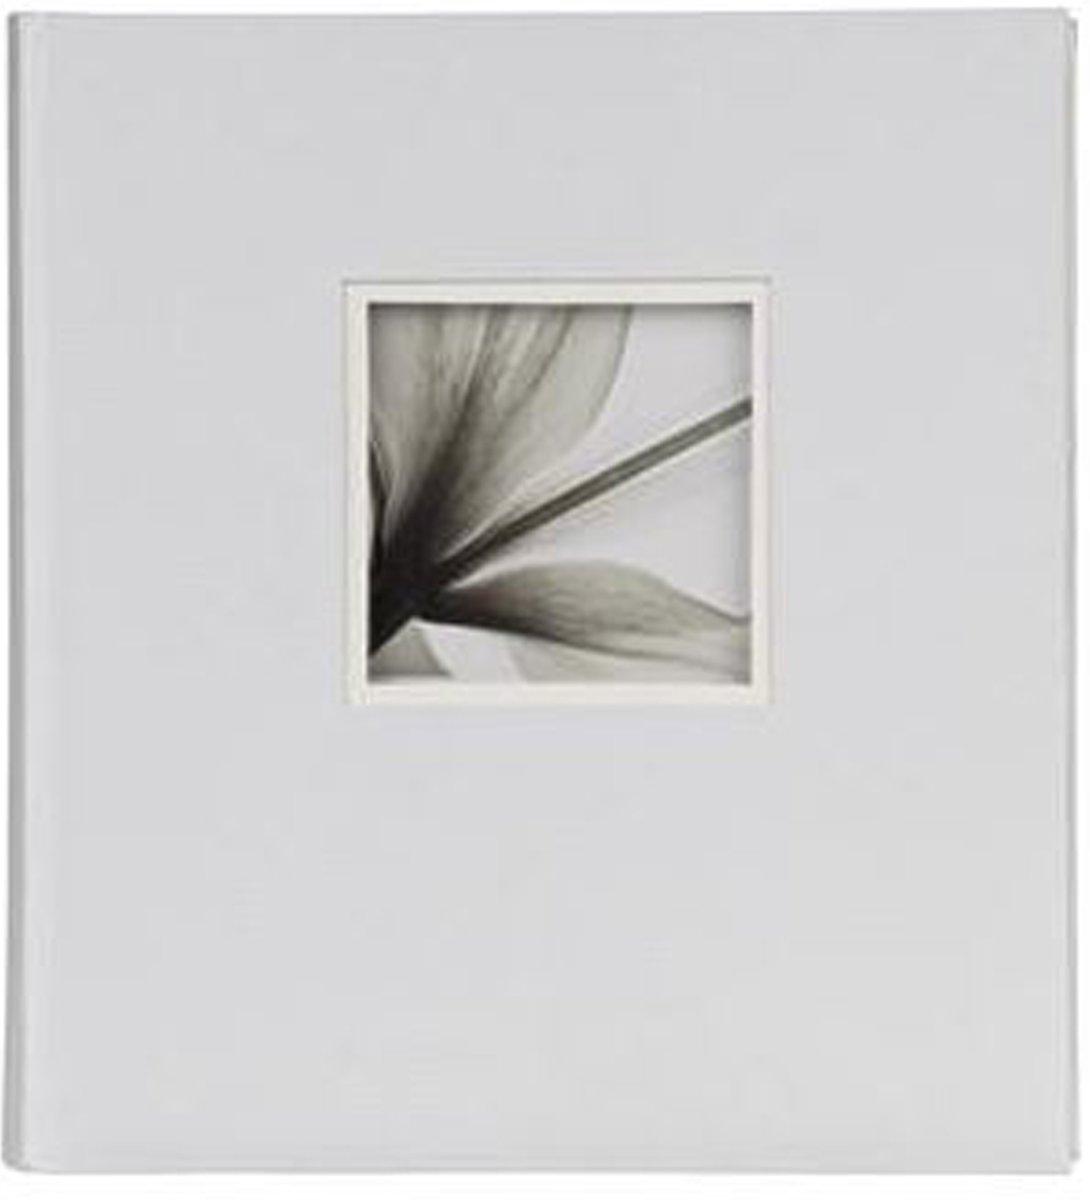 Jumbo Fotoalbum Levels 29x32 cm